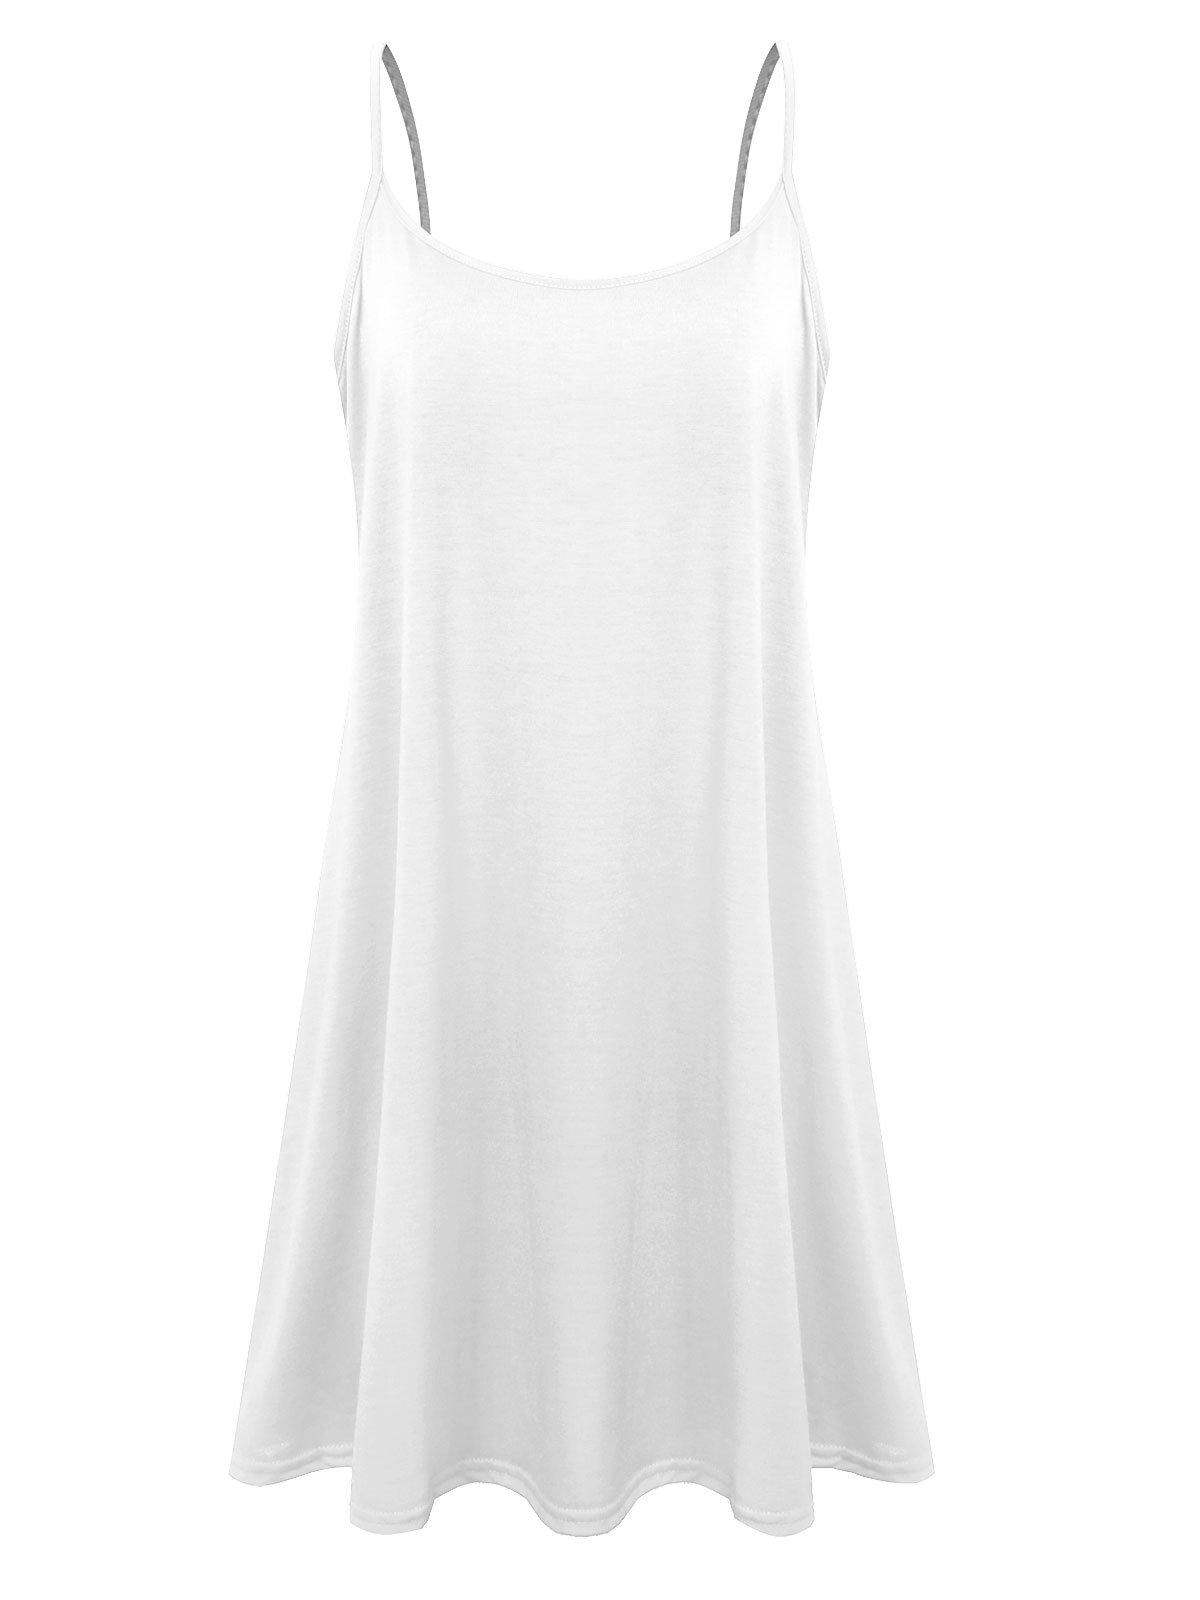 7th Element Plus Size Women's Casual Spaghetti Loose Swing Slip Dress (White,4X)